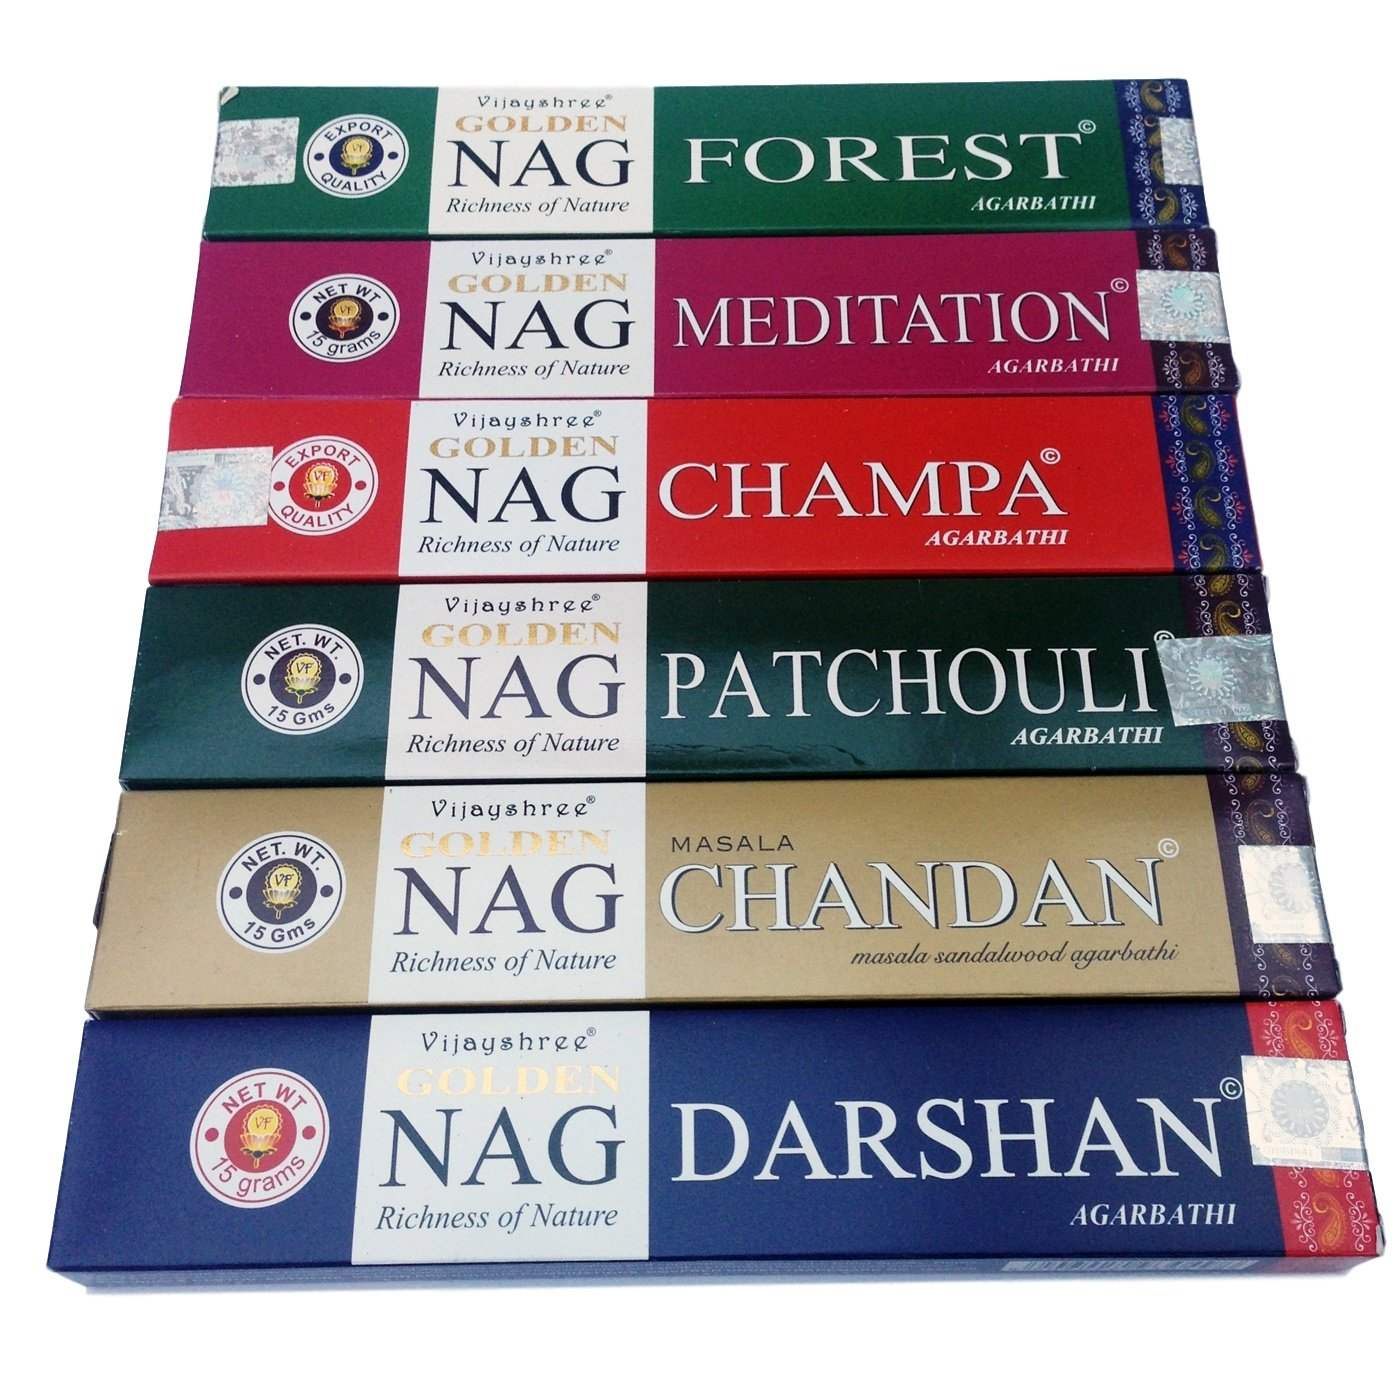 Golden Nag Champa Incense Sticks -Vijayshree-6 Boxes